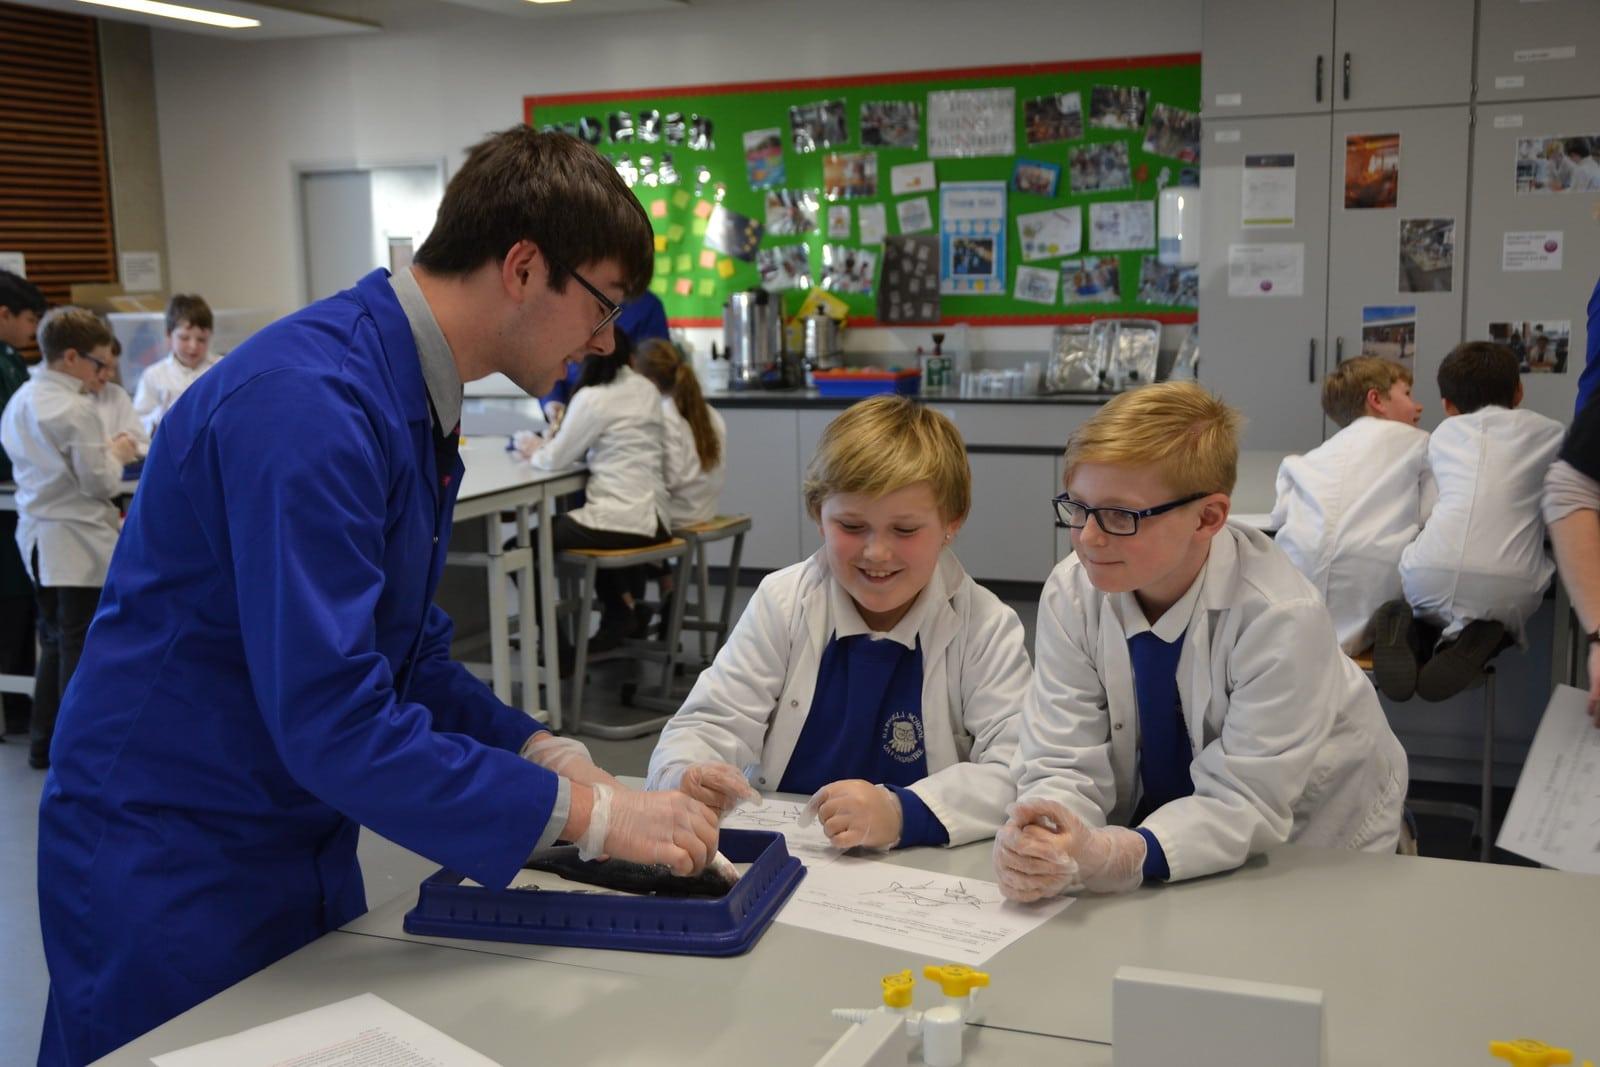 Abingdon School in Partnership lesson with primary school